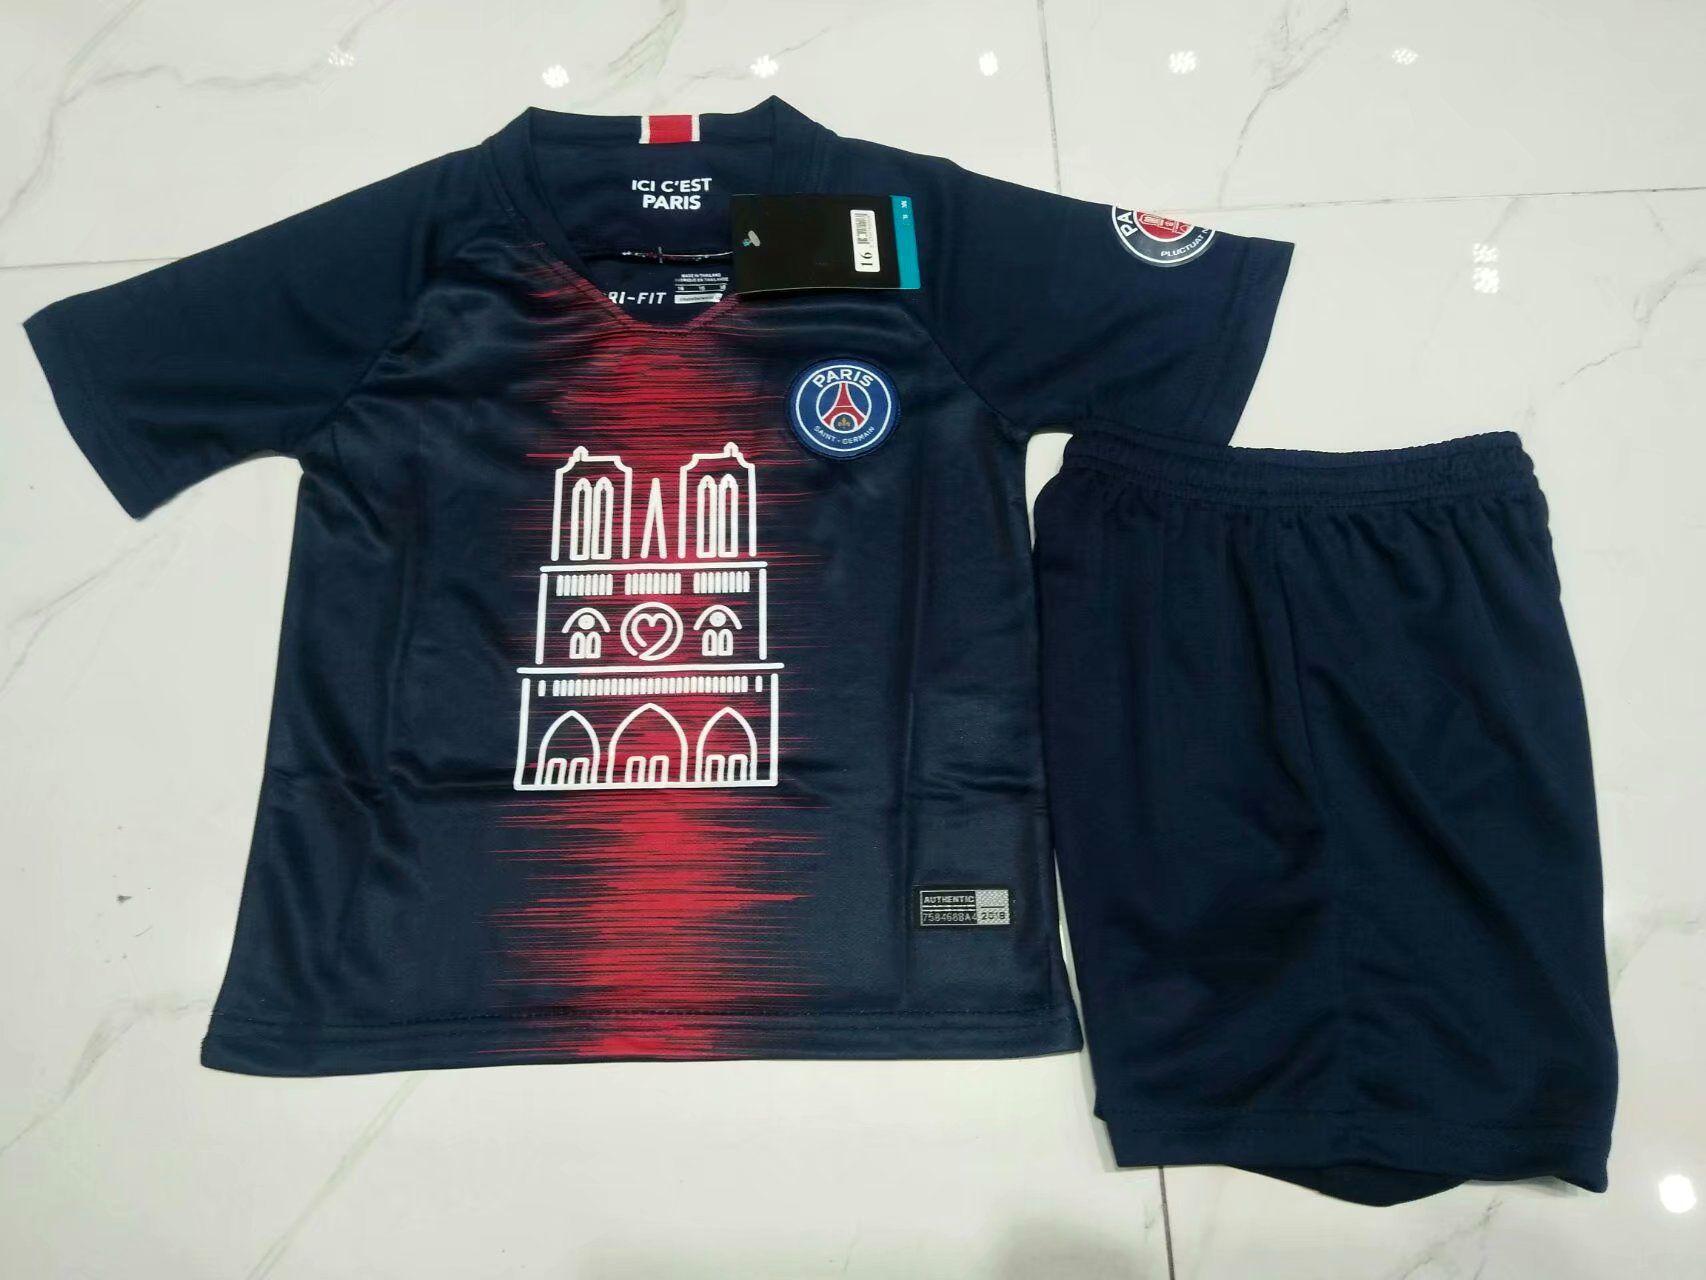 lowest price 00f36 b1654 2019 PSG Notre Dame Soccer Jersey Kits Notre Dame 19 20 MBAPPE CAVANI Saint  Germain DANI ALVES Mbappé DI MARIA Thailand 2019 2020 Football Shirt From  ...